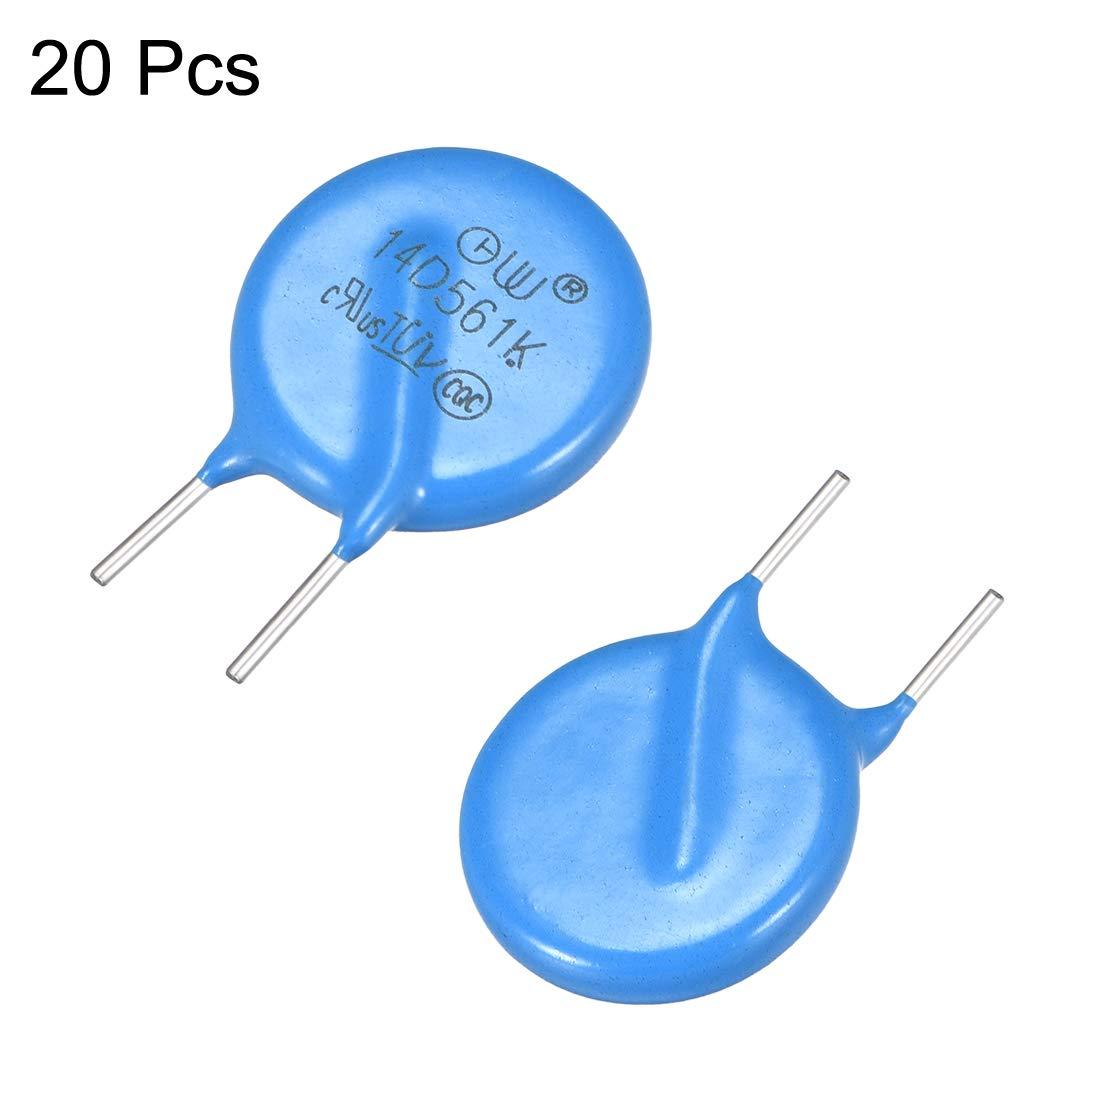 uxcell 20Pcs Voltage Dependent Resistors AC 350V 14D561K L5 Radial Lead Disc Varistors